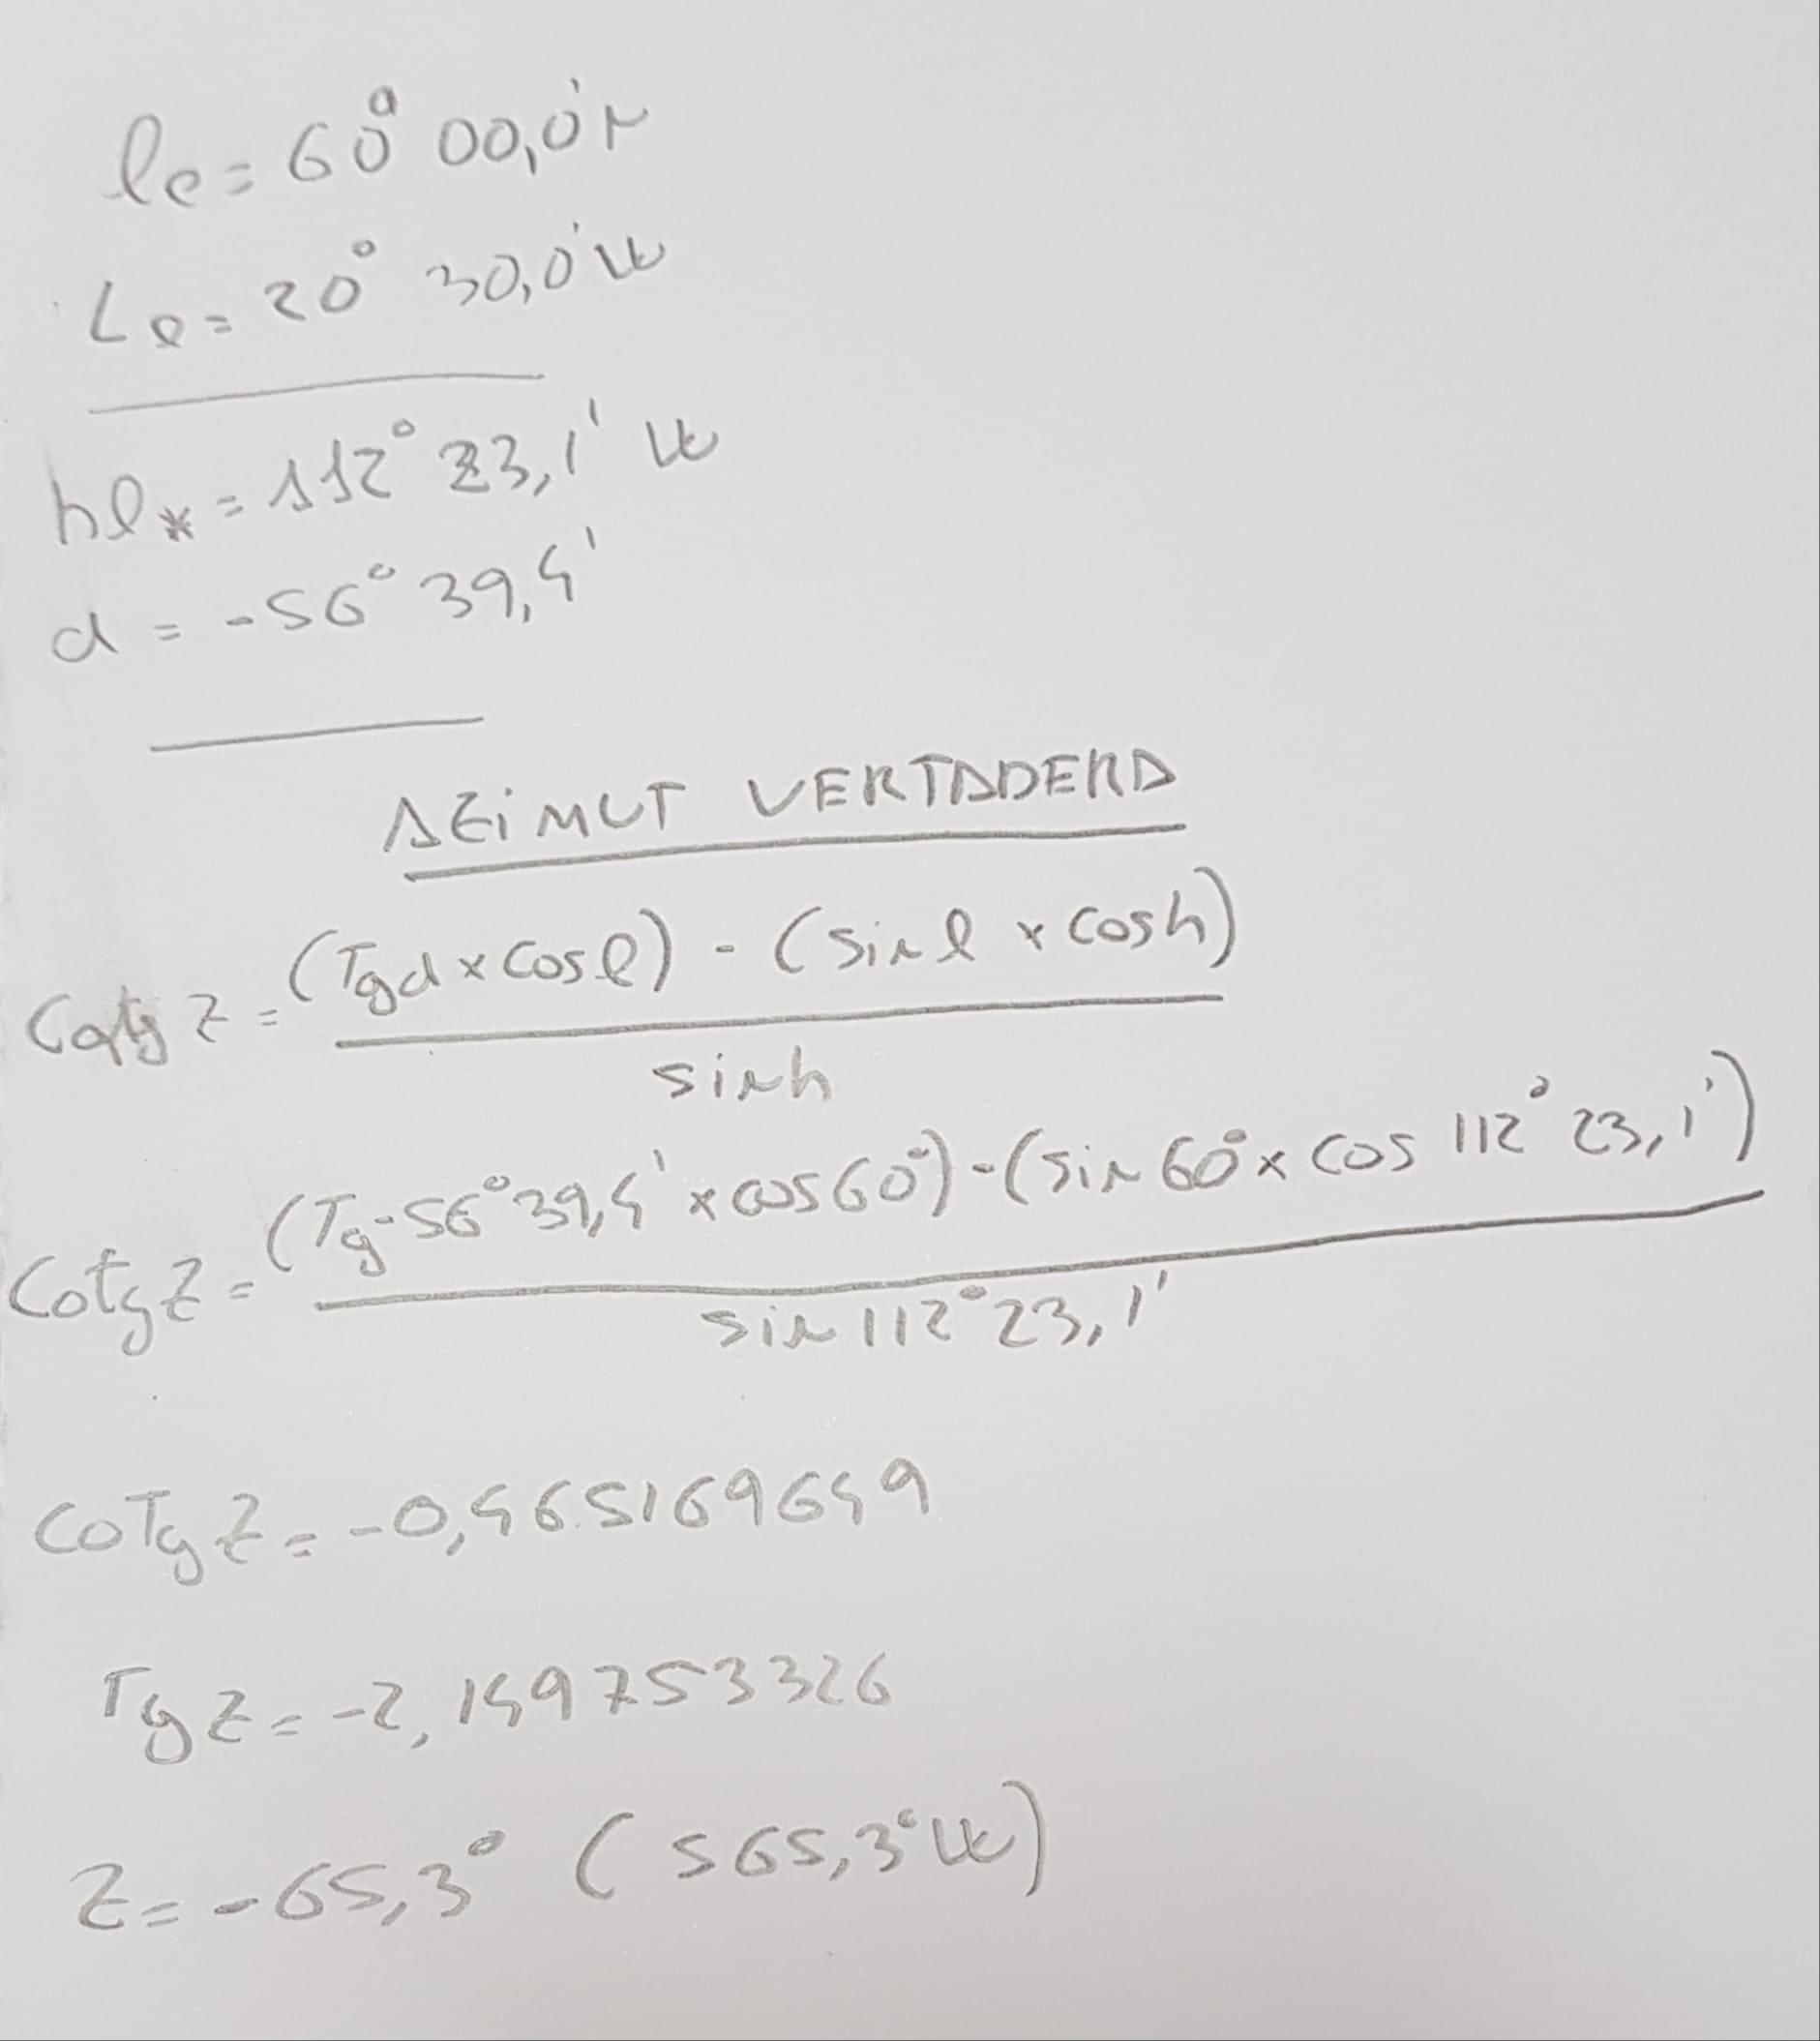 Cálculo Azimut Examen astronomia Capitán de Yate